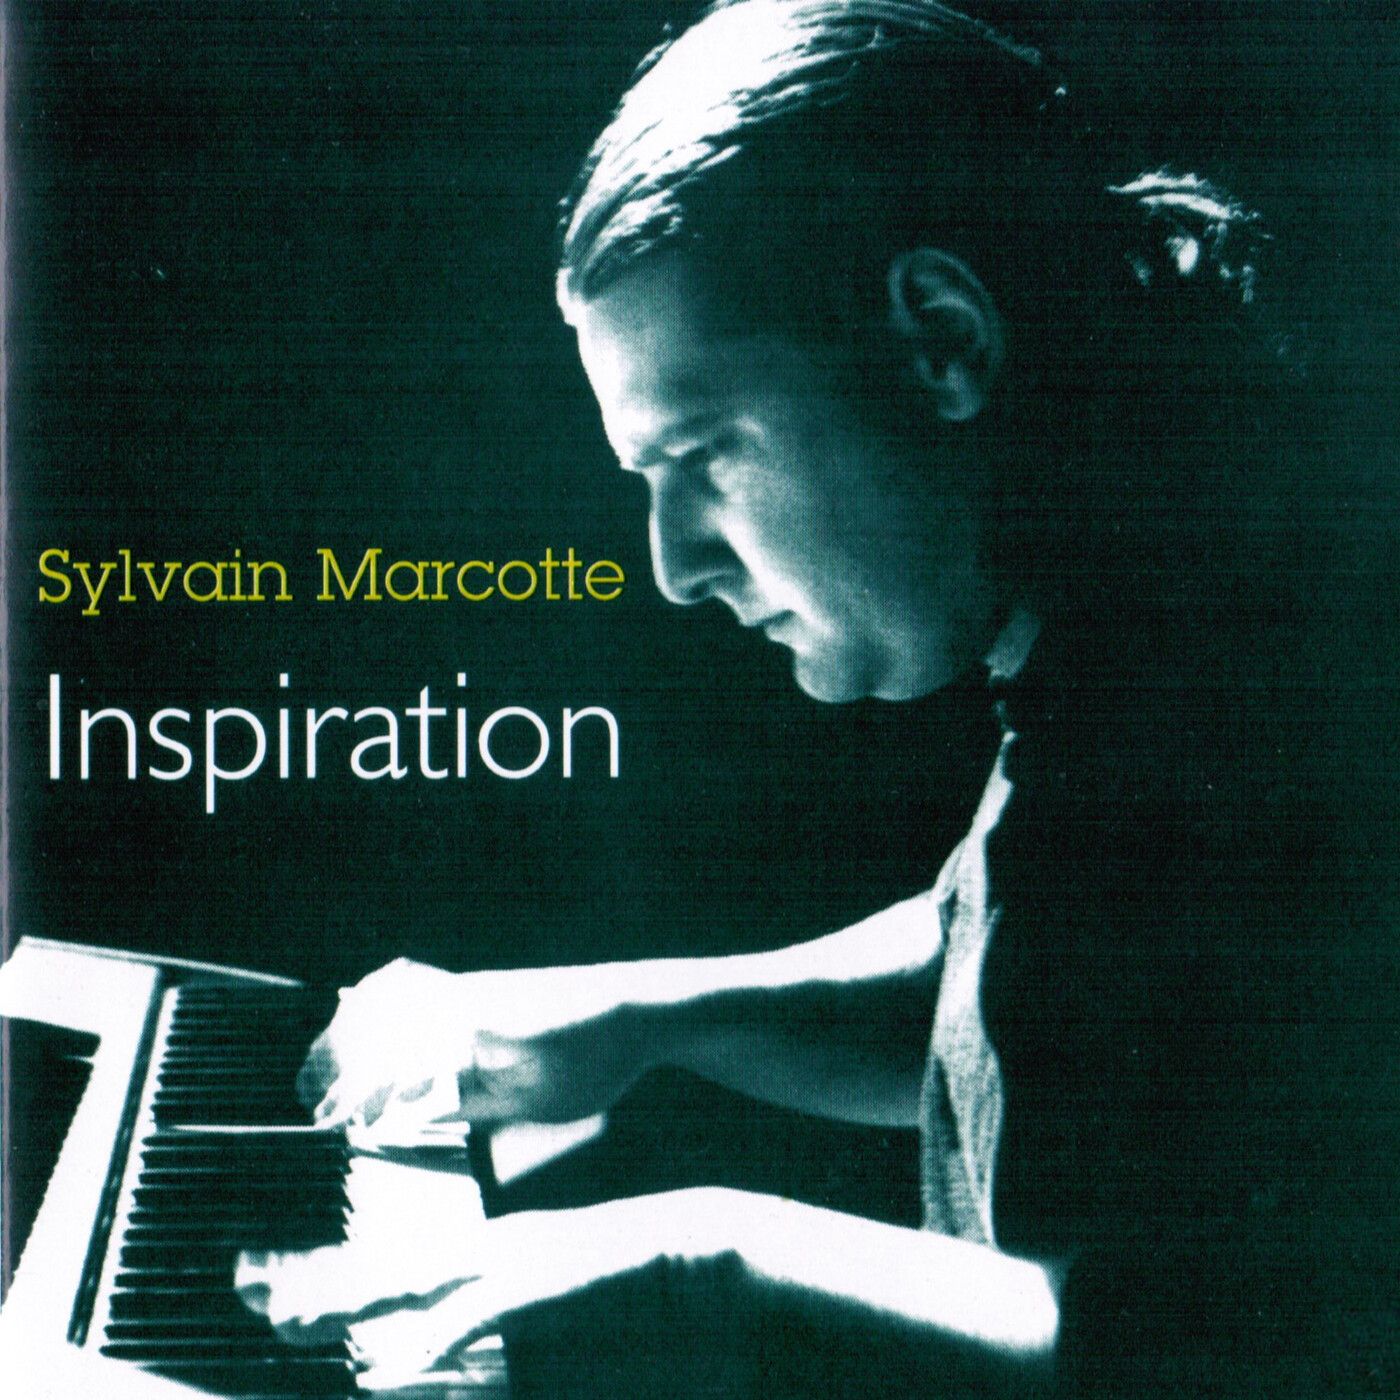 Inspiration - Sylvain Marcotte